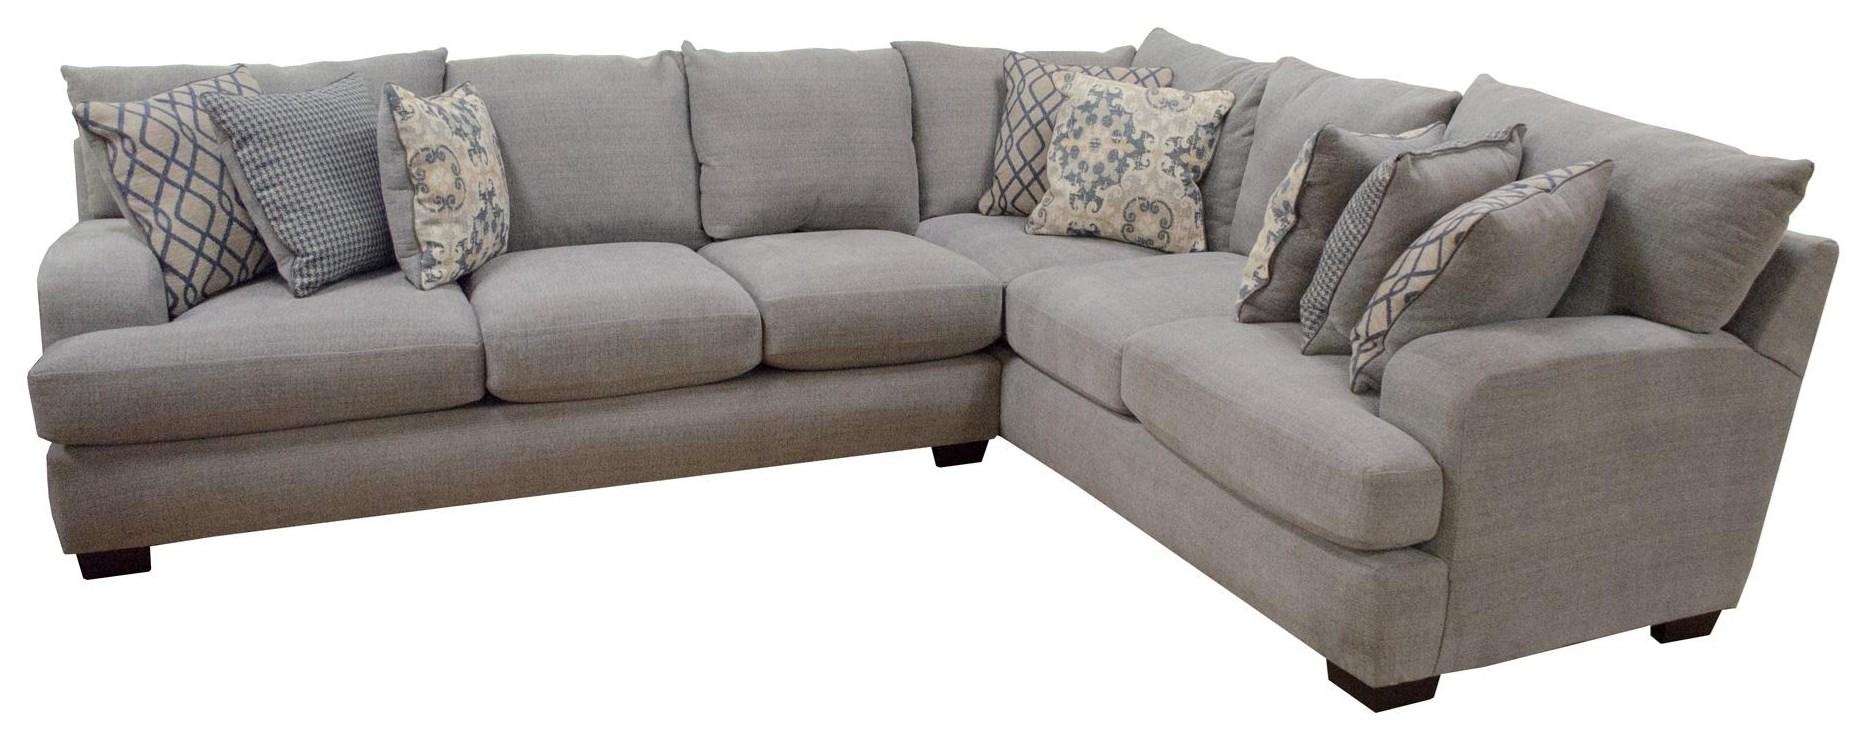 Seminole Furniture Portofino Graphite Sectional - Item Number: GRP-3780-SECTIONAL